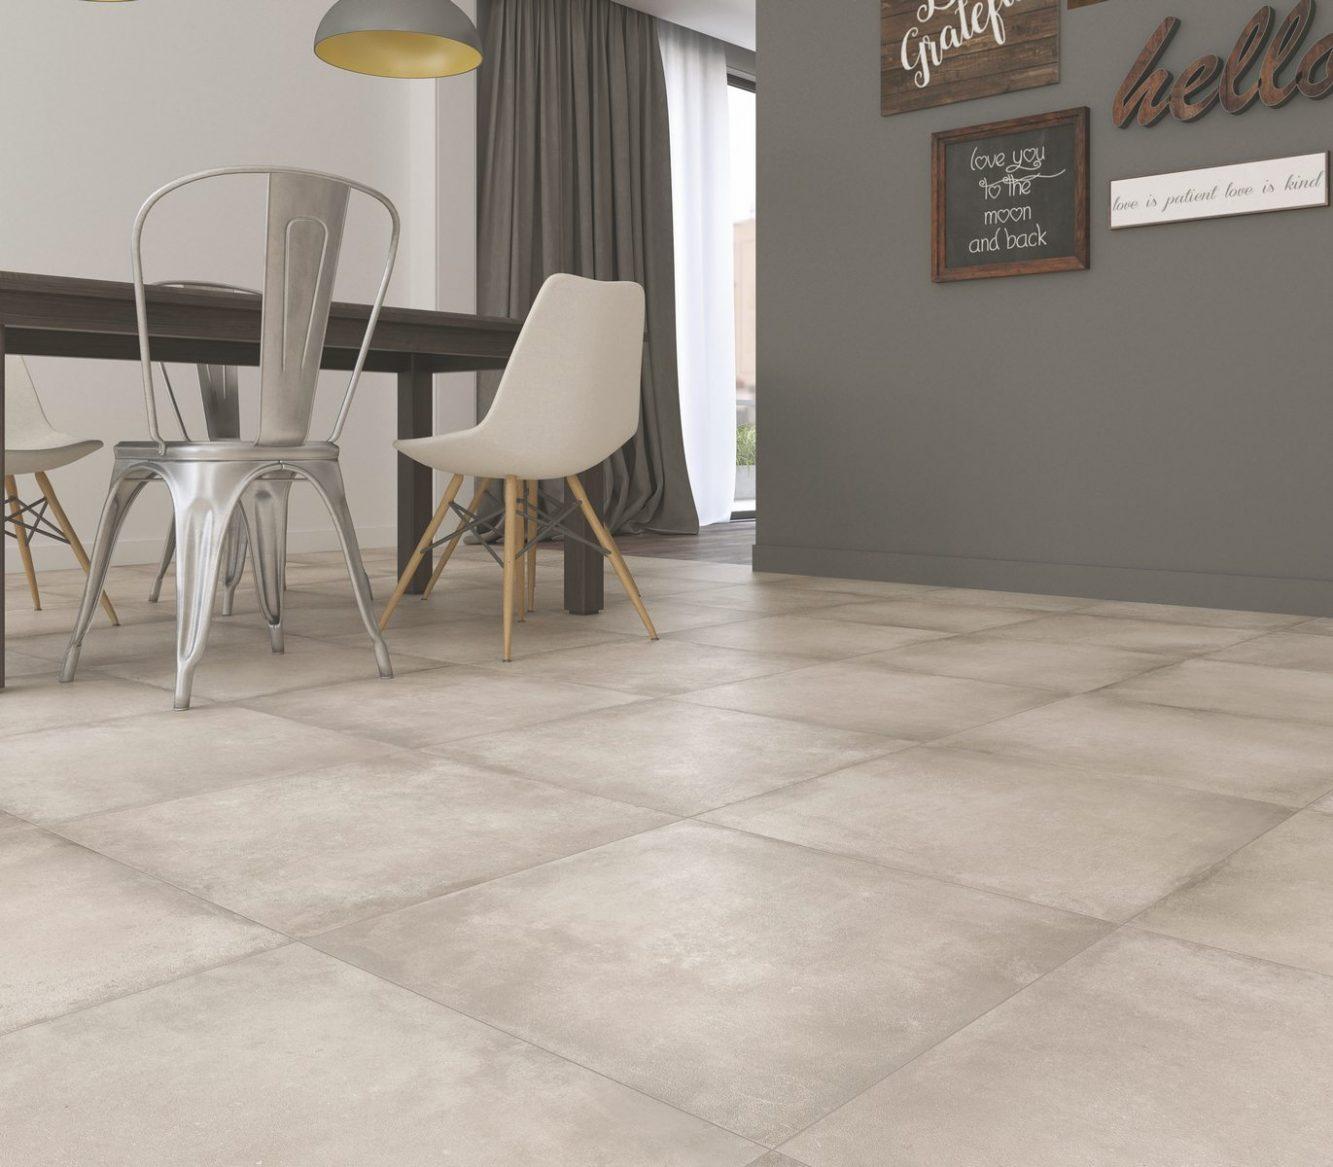 Cerámica San Lorenzo Porcelanato Terraferma Cemento